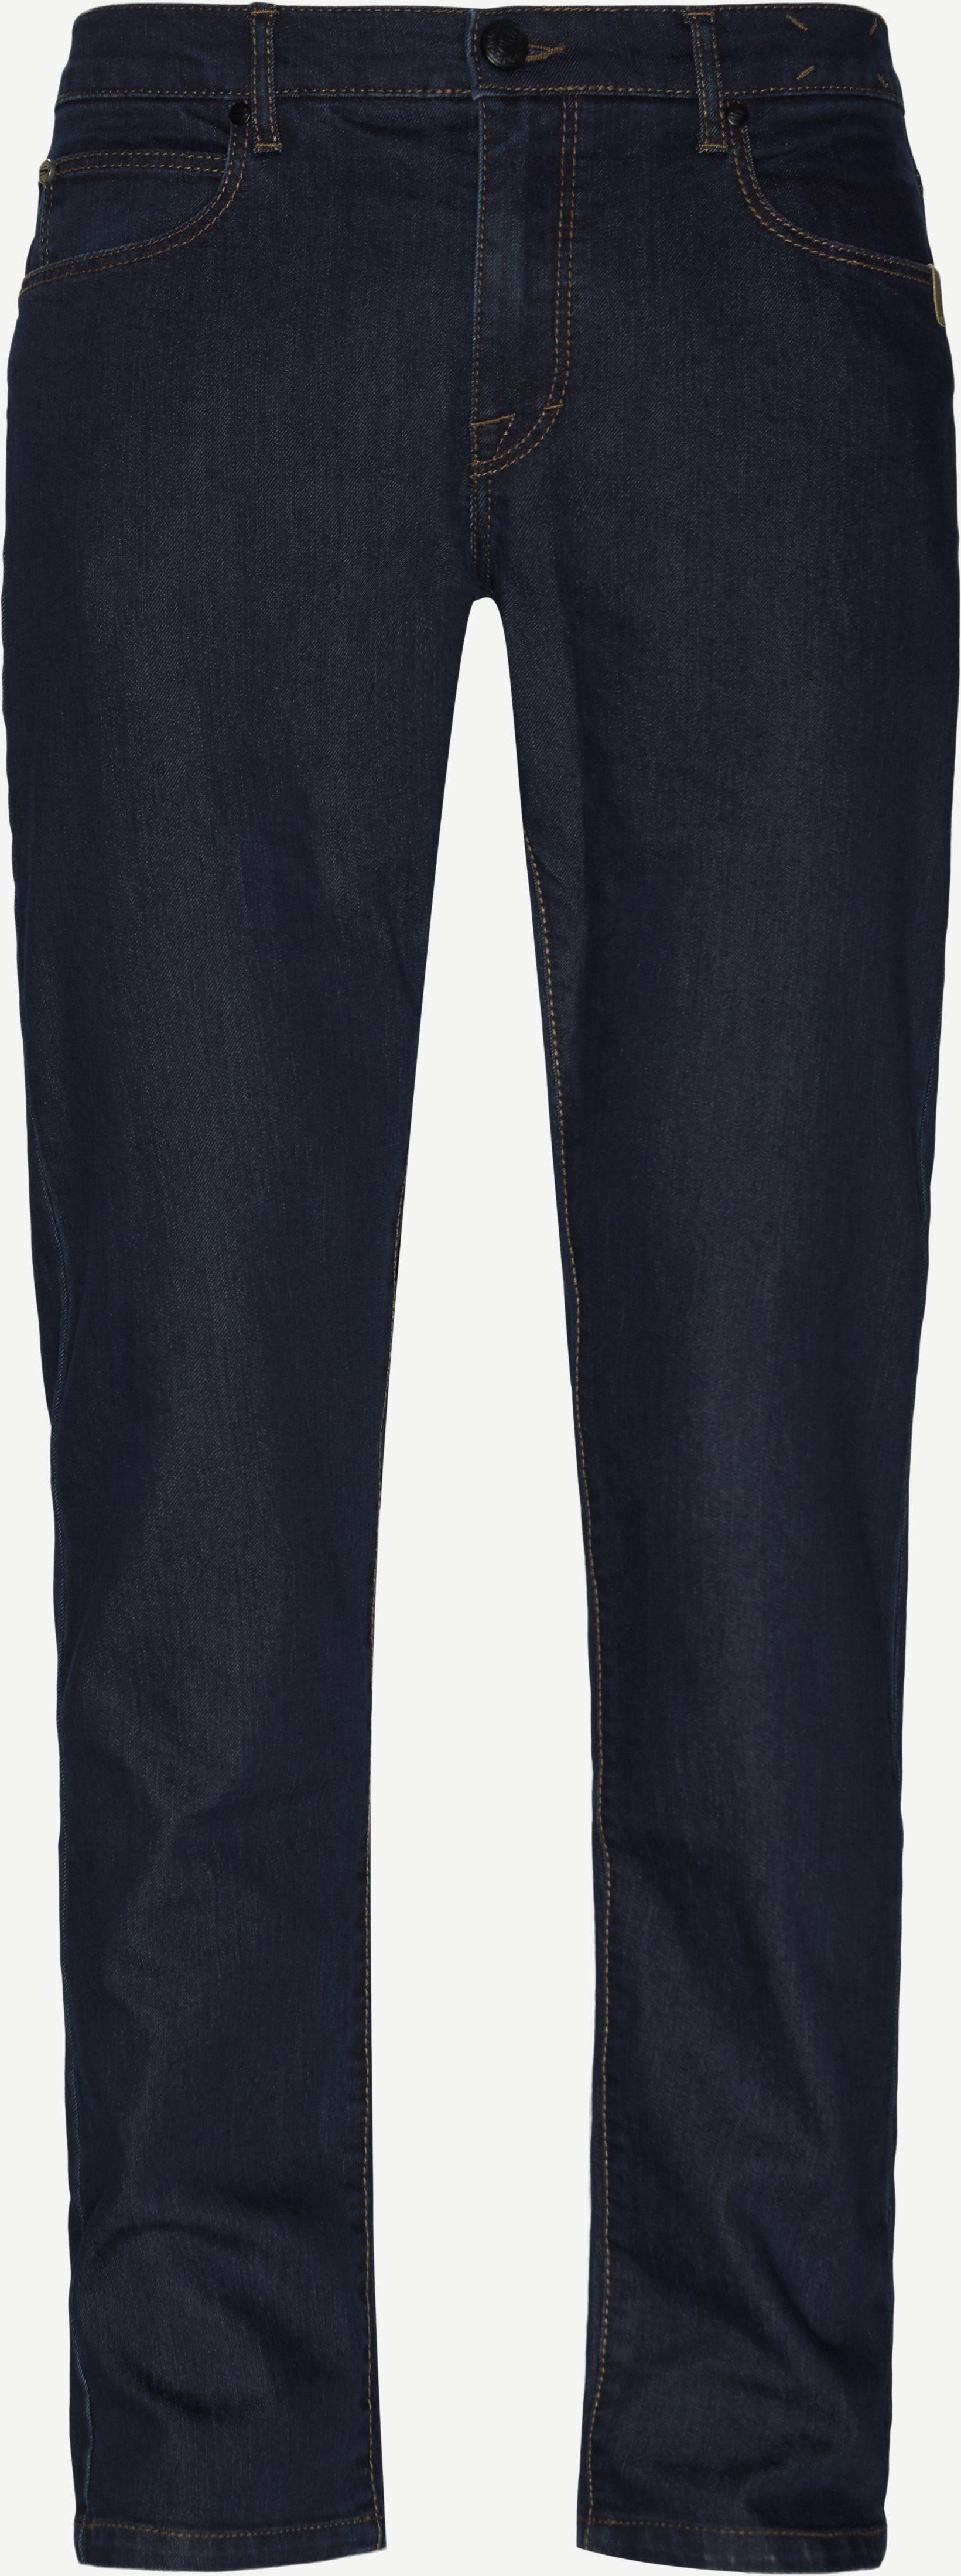 S Stretch H Burton N Jeans - Jeans - Modern fit - Denim